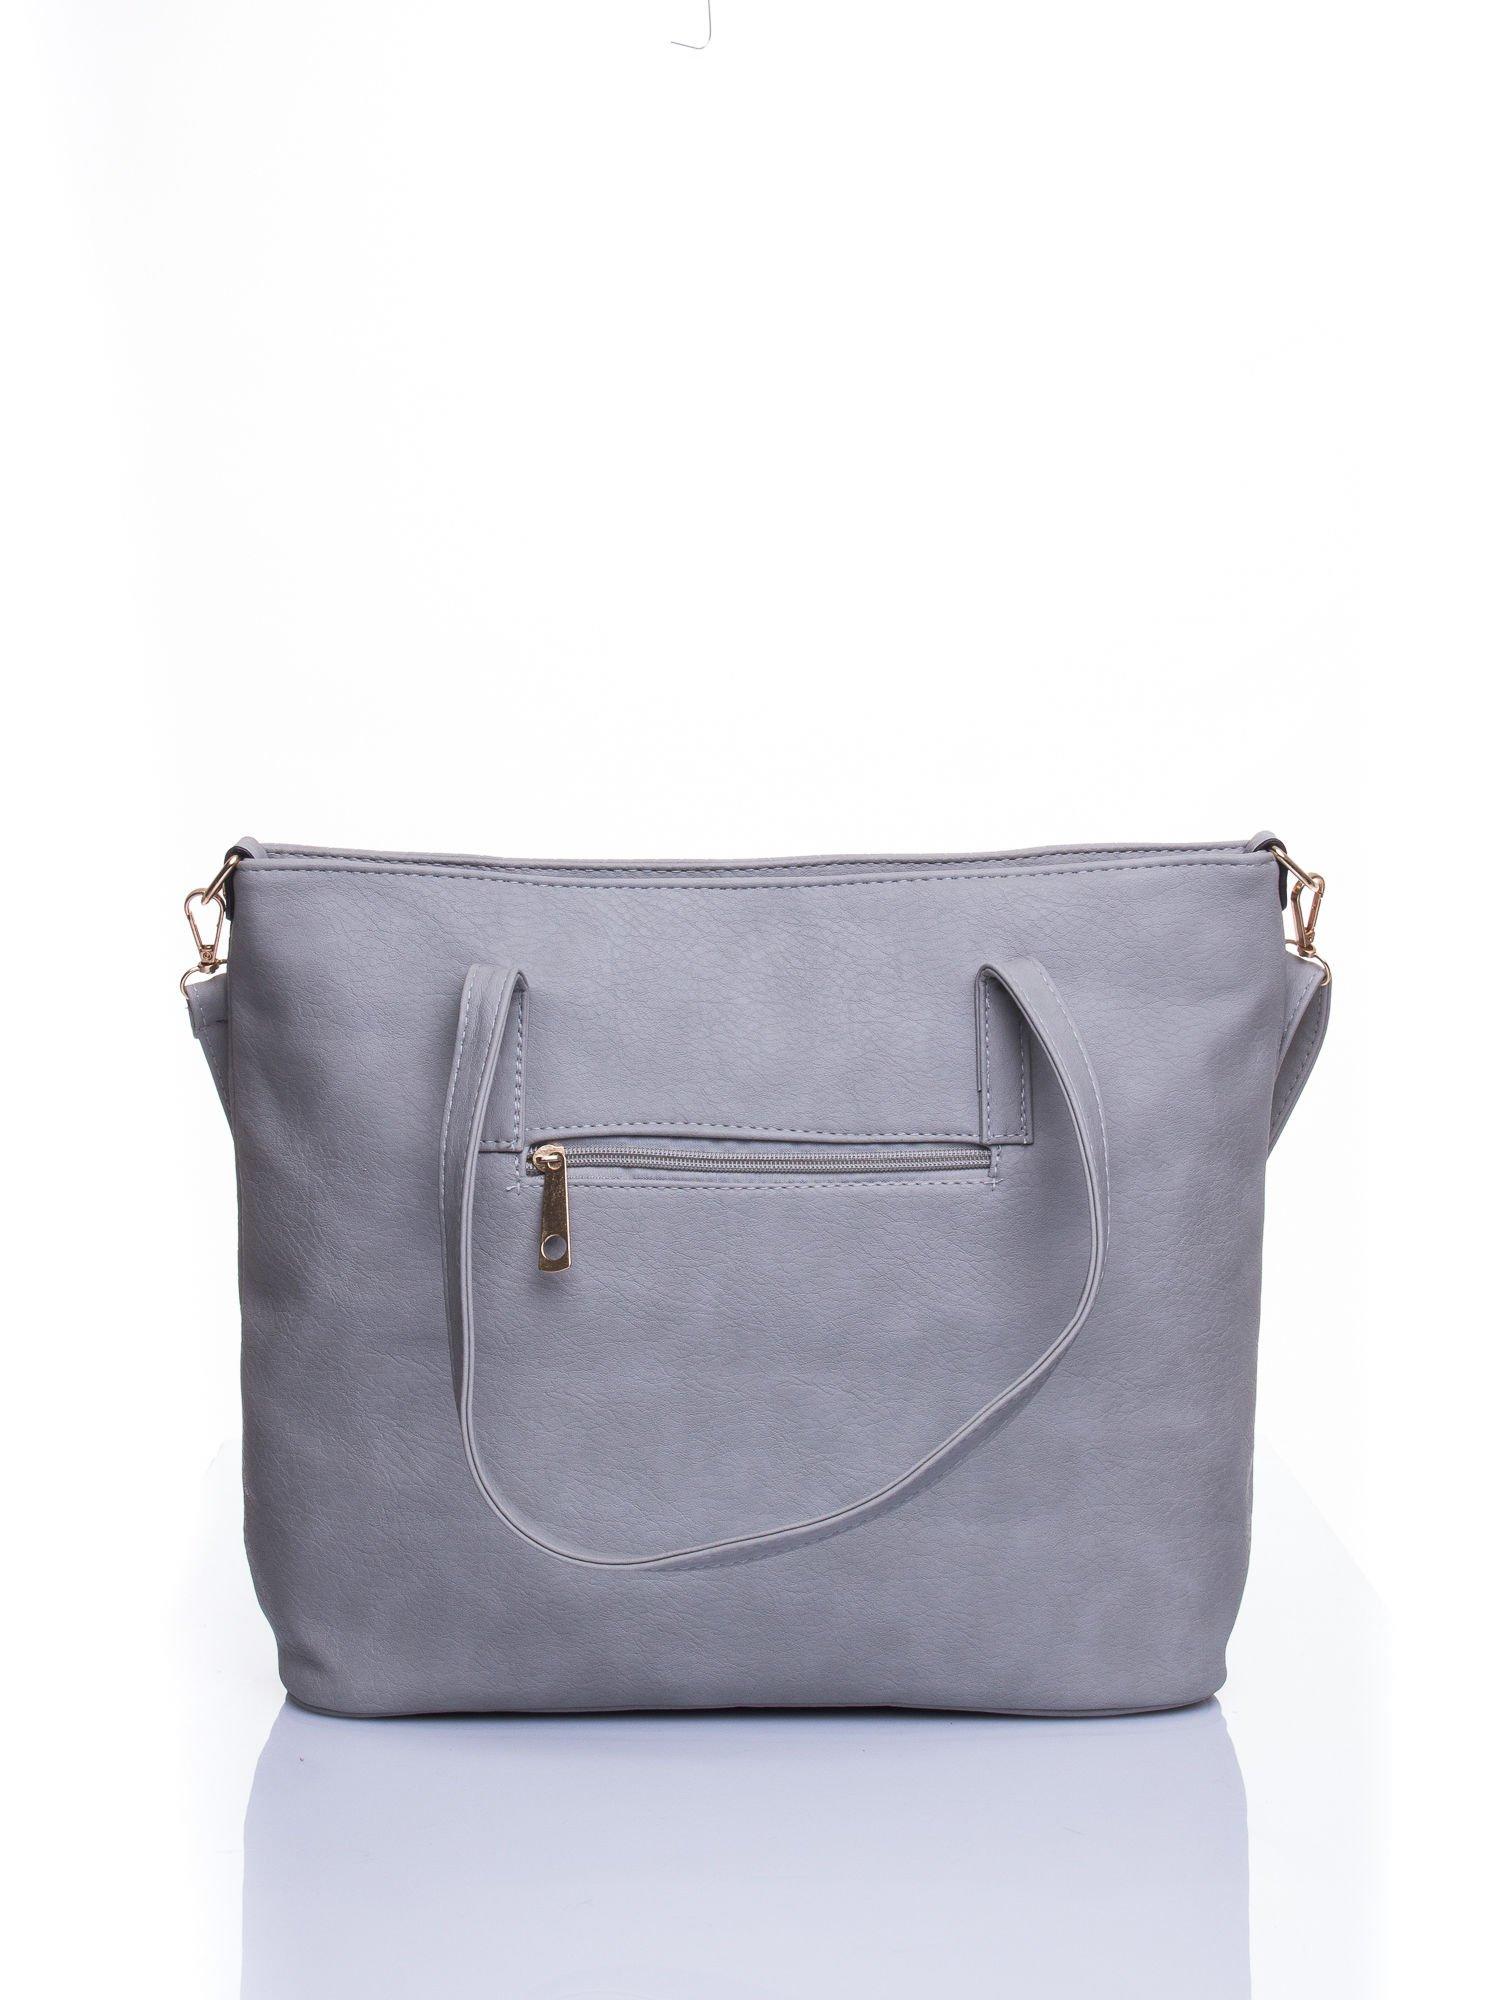 Szara fakturowana torba shopper bag                                  zdj.                                  3